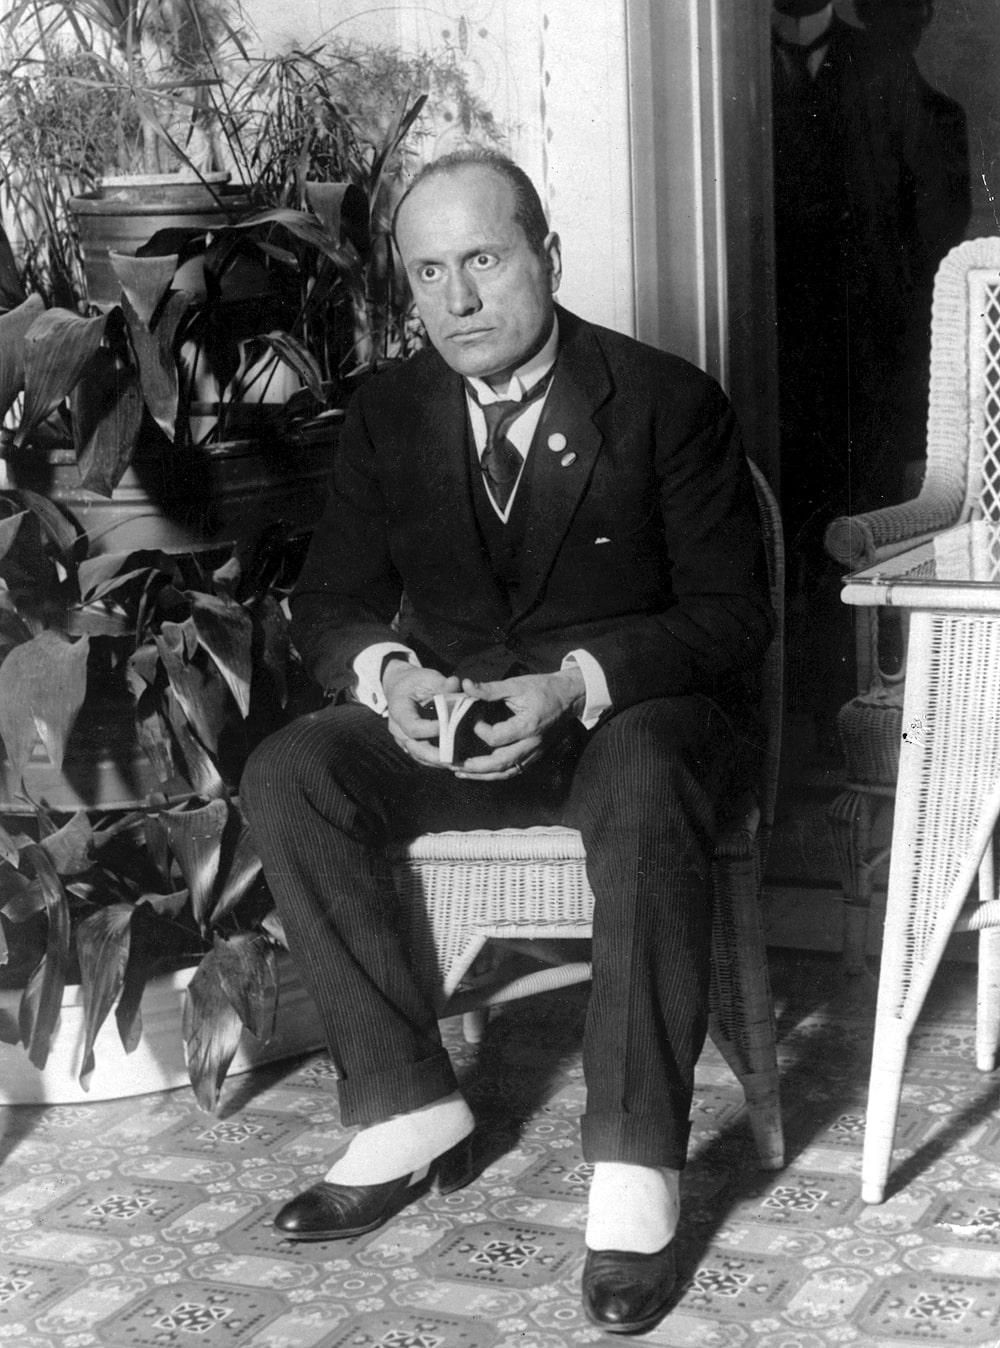 Benito-Mussolini-interesnyefakty.org-3